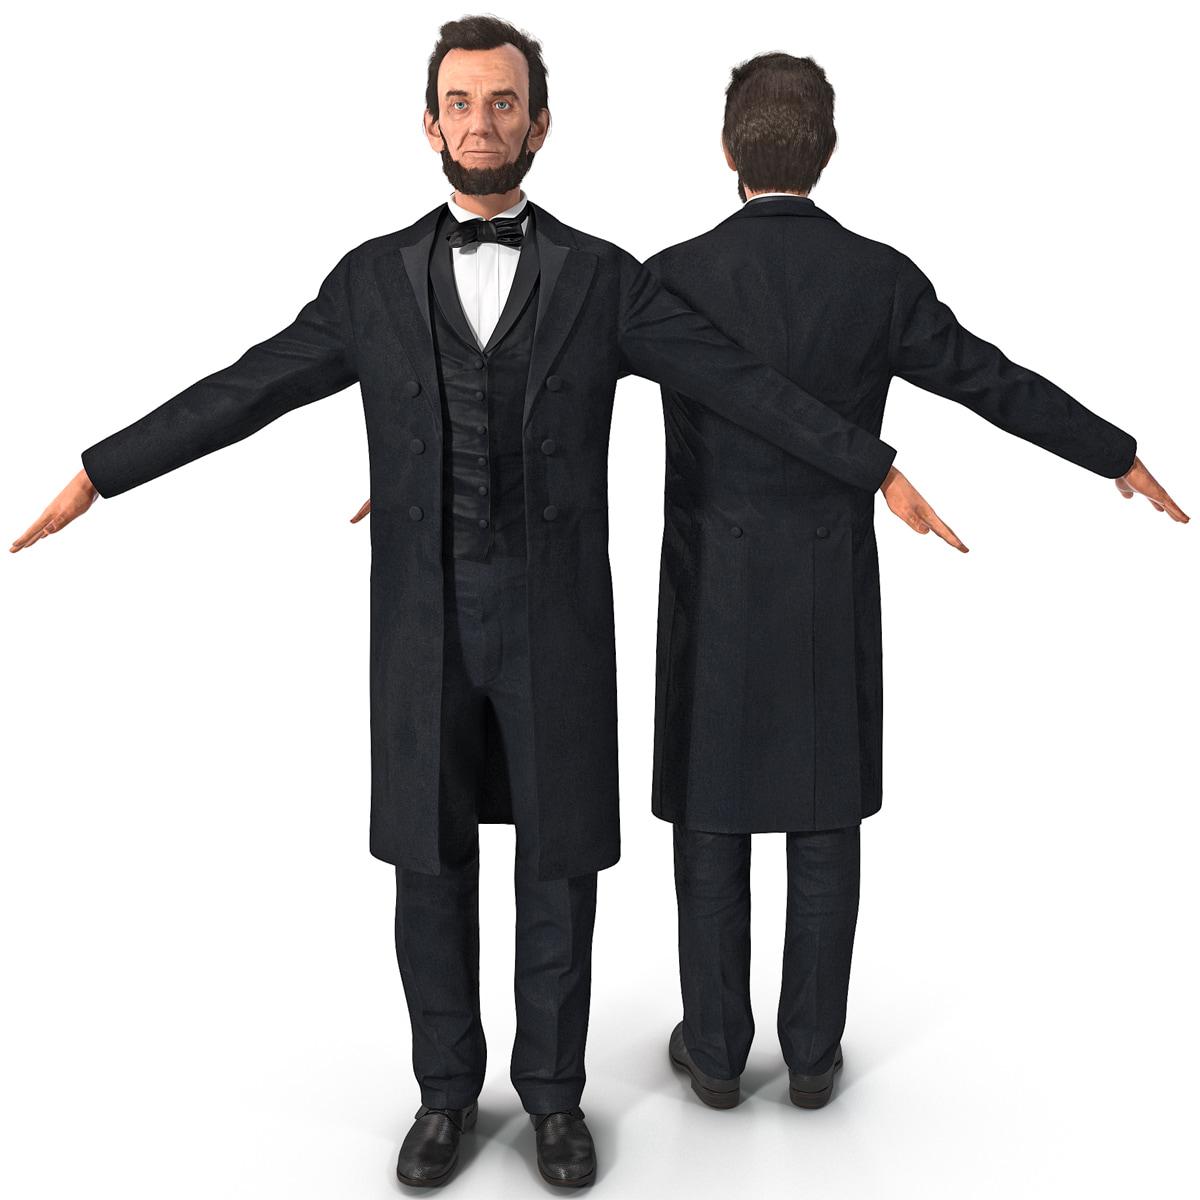 Abraham Lincoln_9.jpg